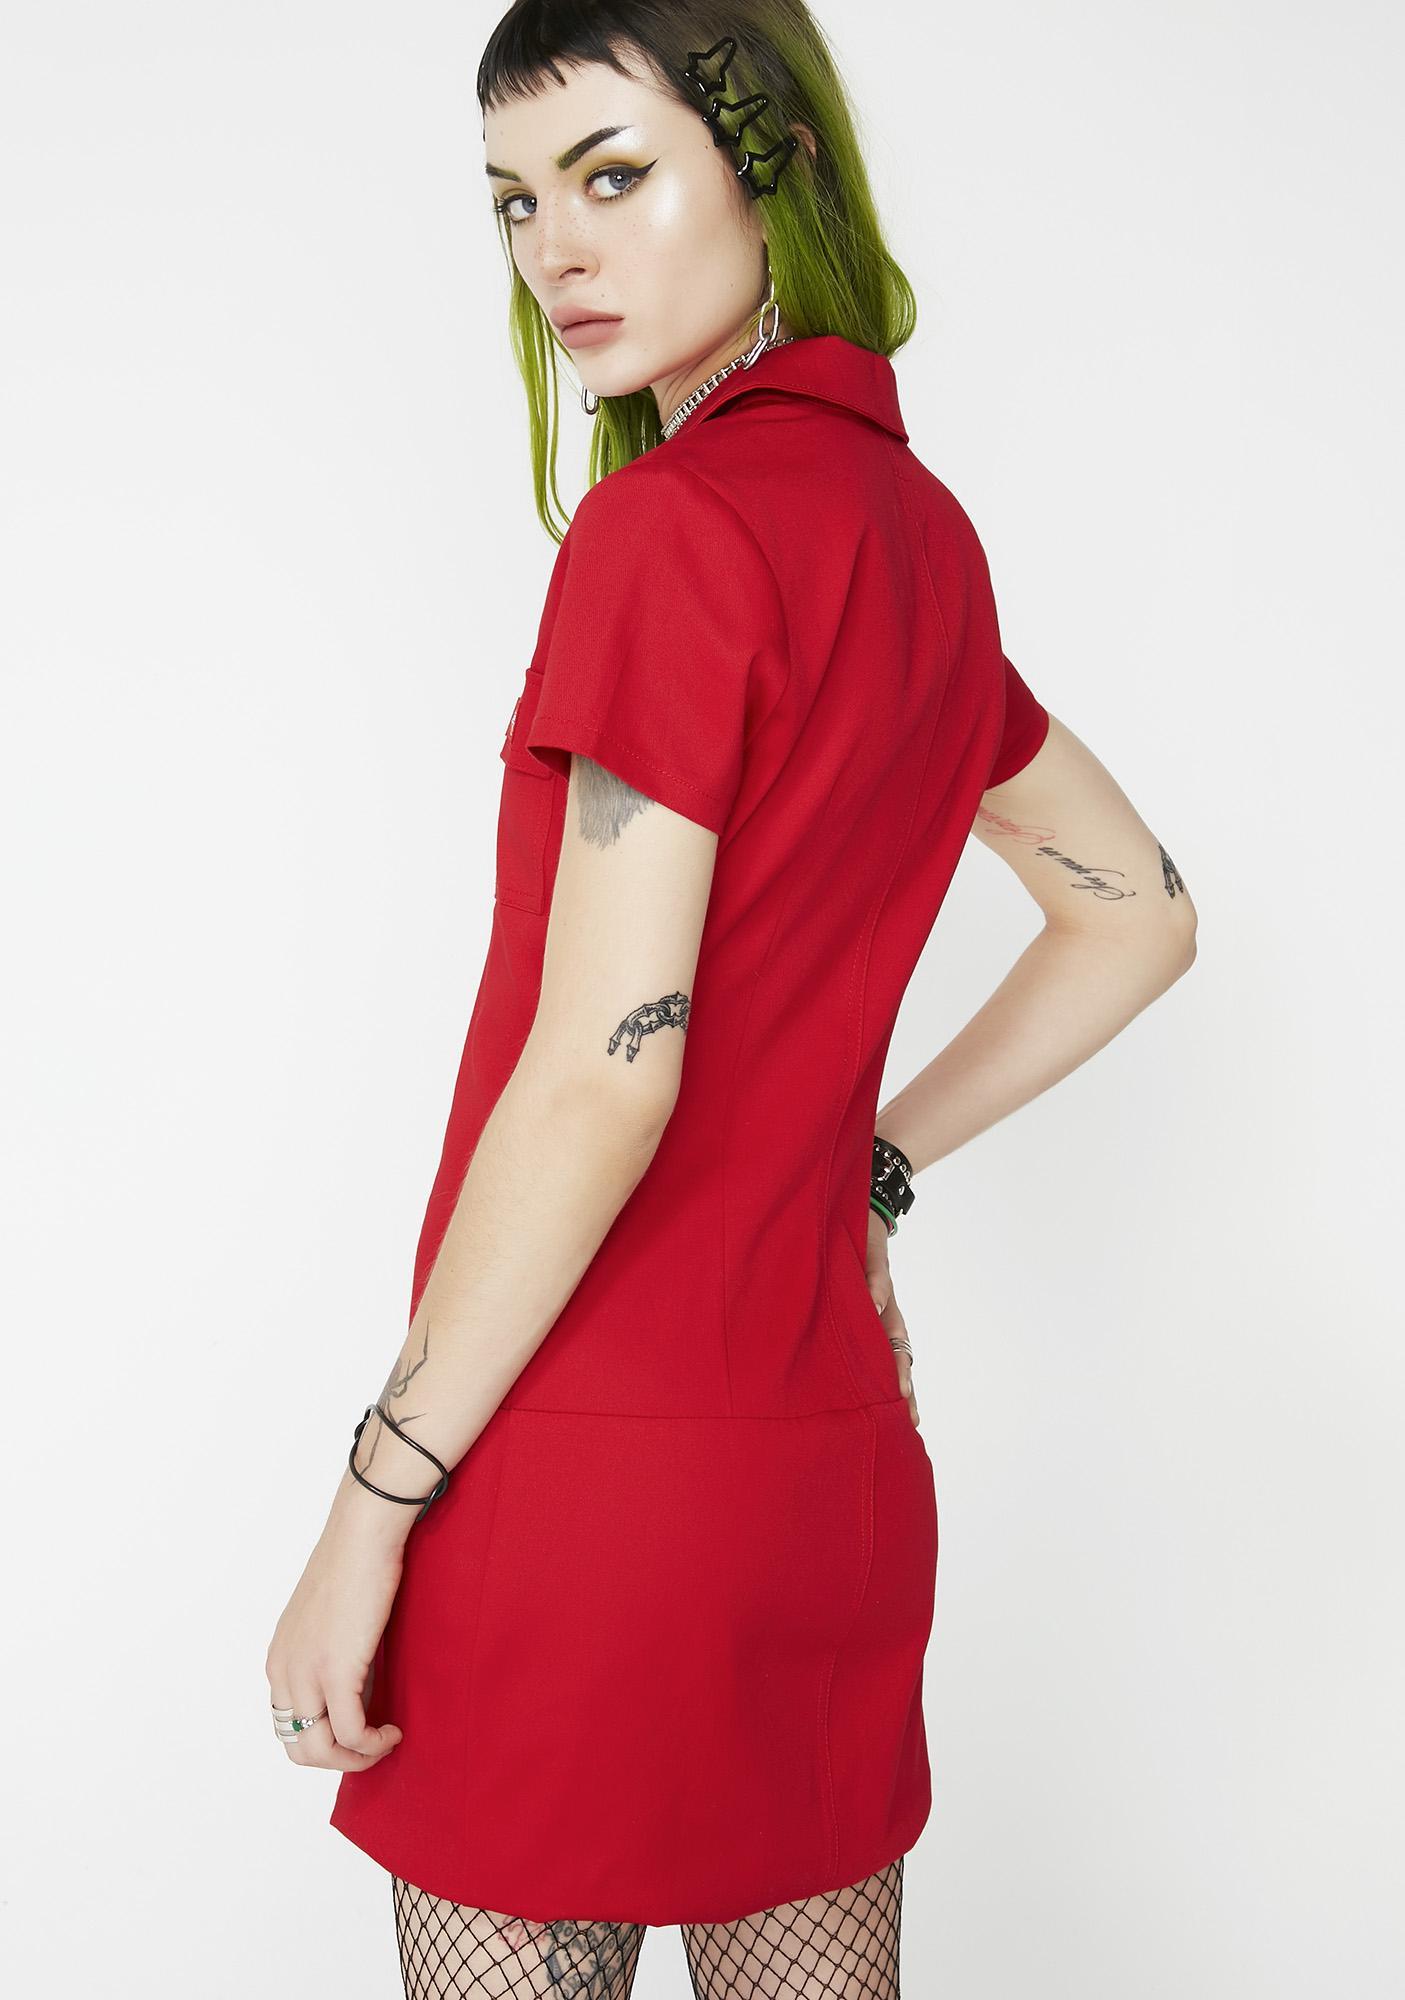 Dickies Girl Bloody Annie Zipper Dress